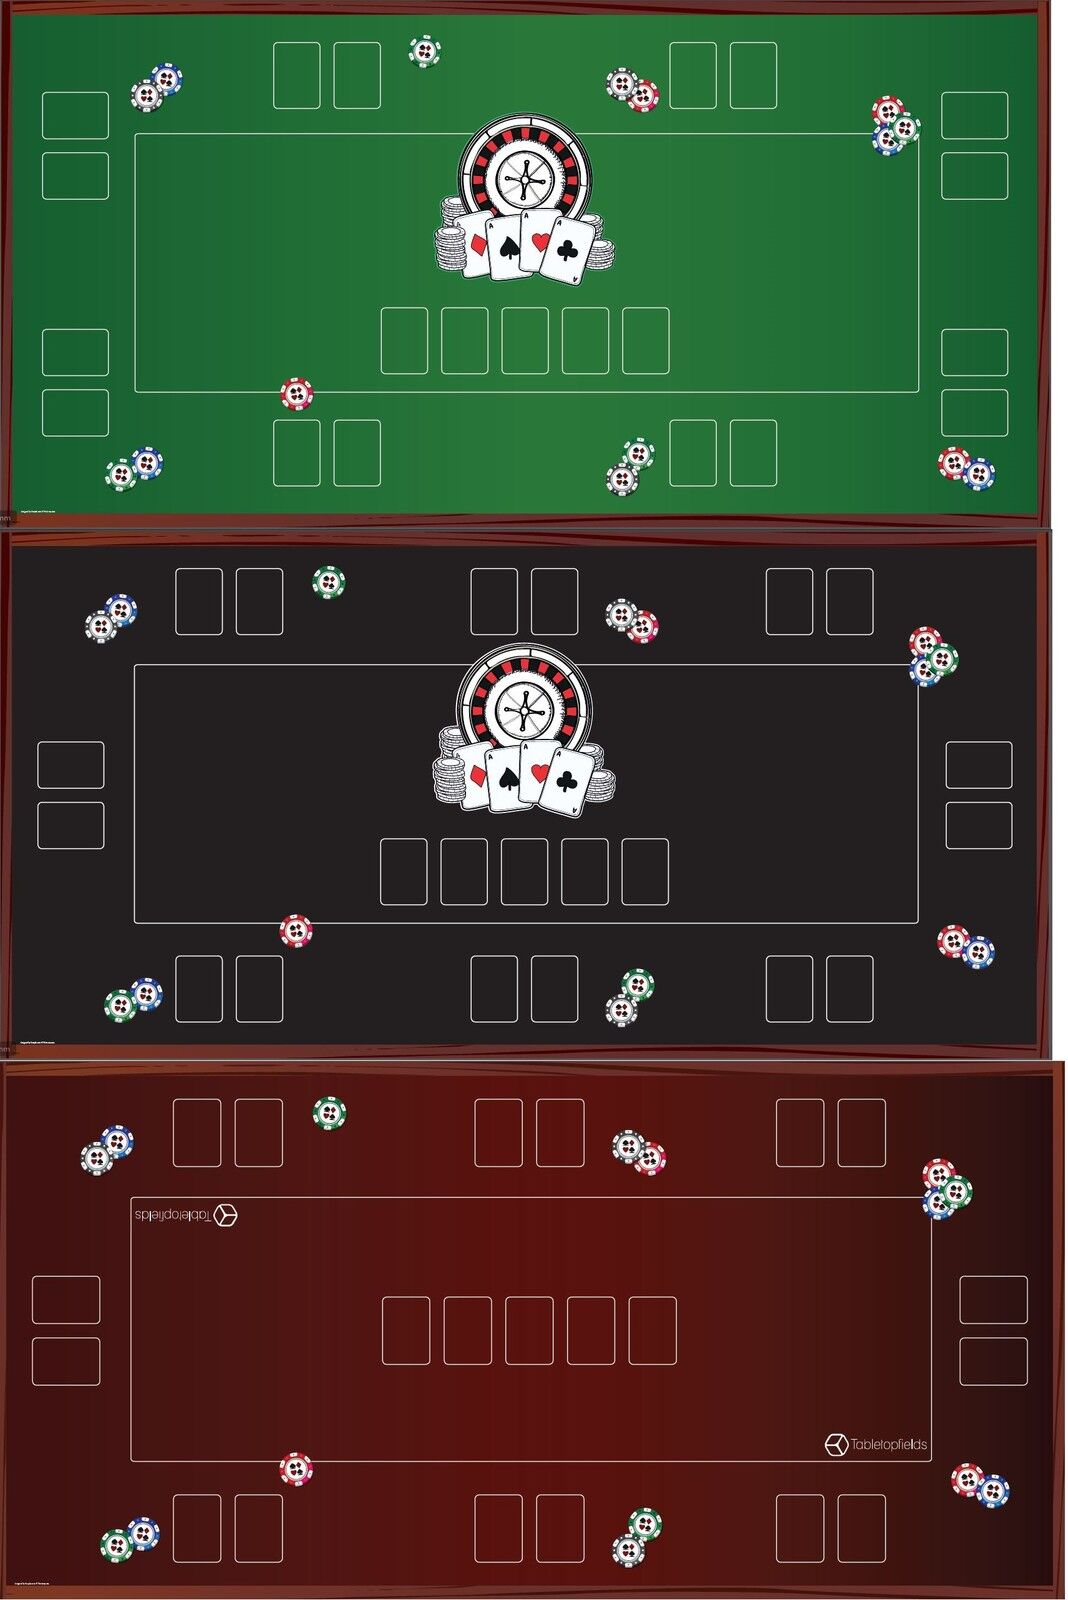 Table de poker édition   poker tapis   table de poker   poker Mat   texas texas   Custom   160x80 CM